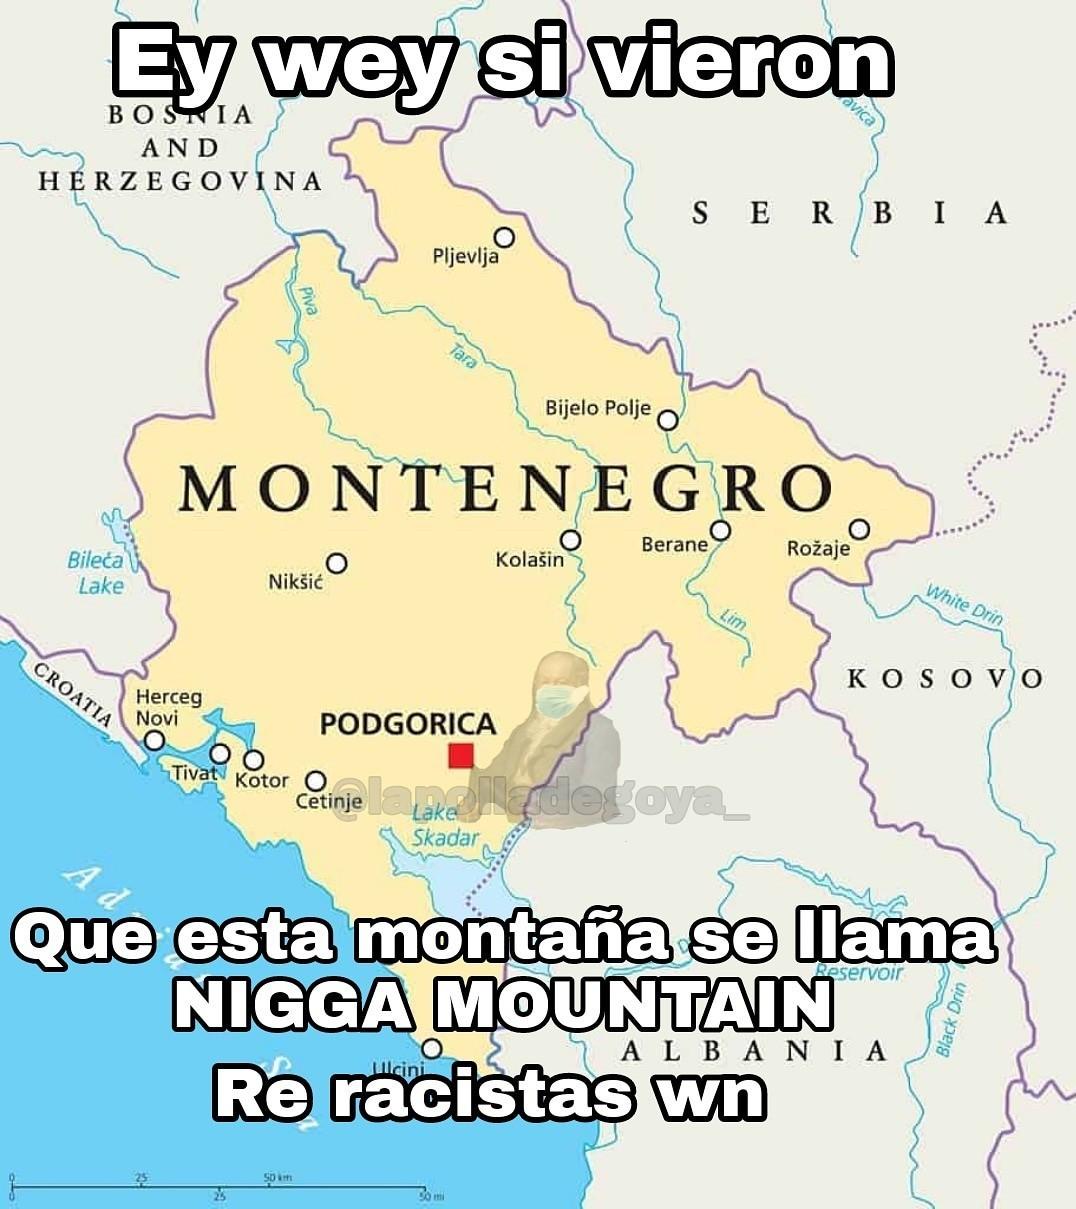 Re racistas wnnnn - meme